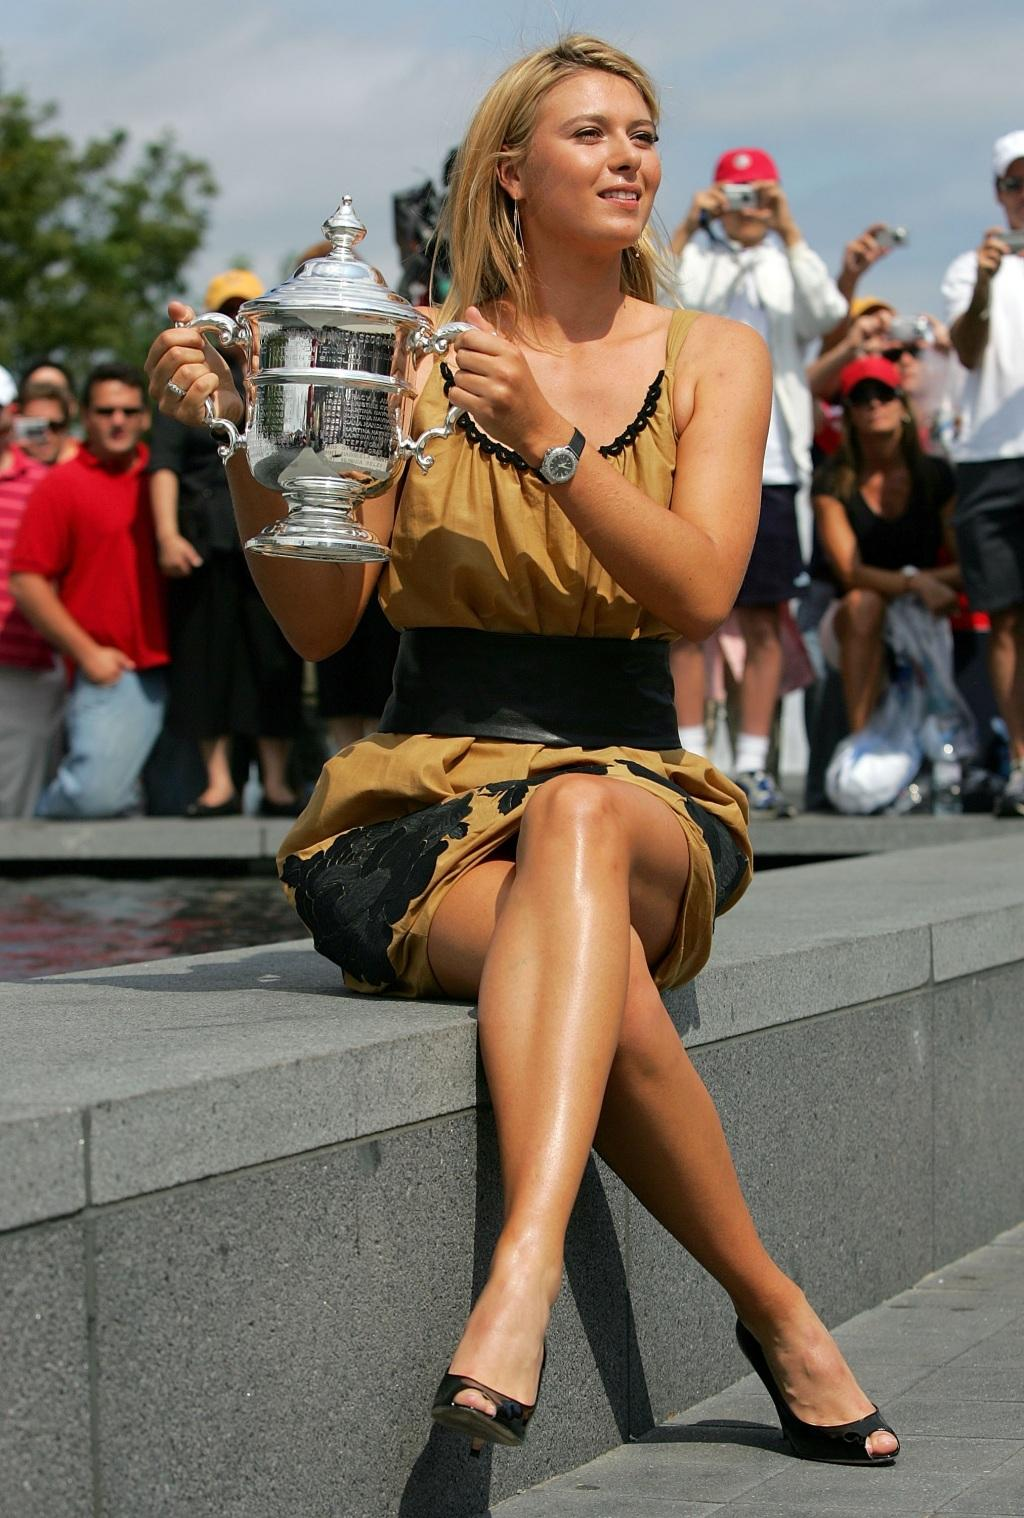 Rus tenisçi Maria Sharapova,